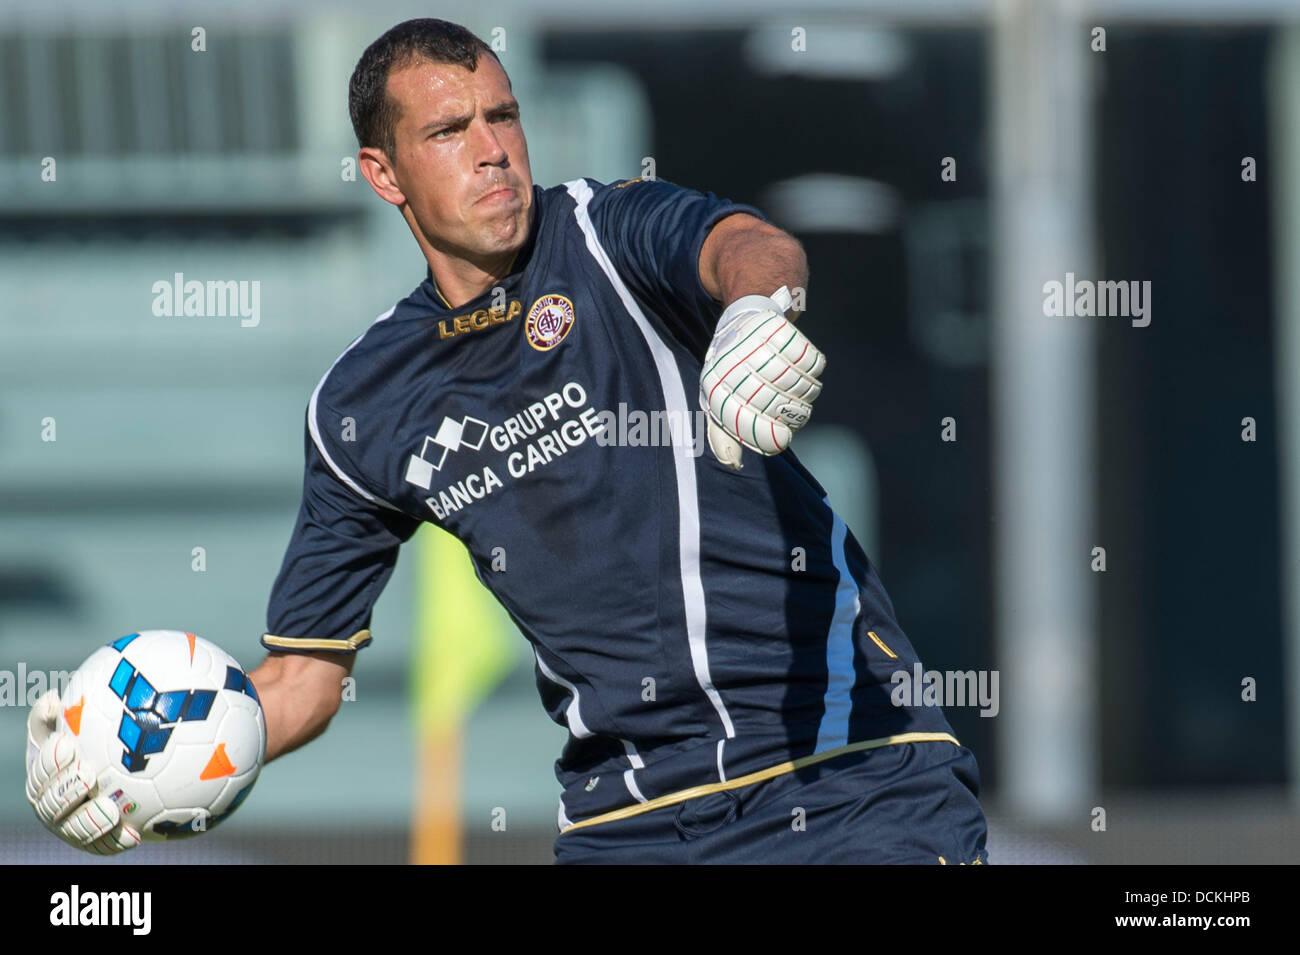 Luca Mazzoni Livorno AUGUST 17 2013 Football Soccer